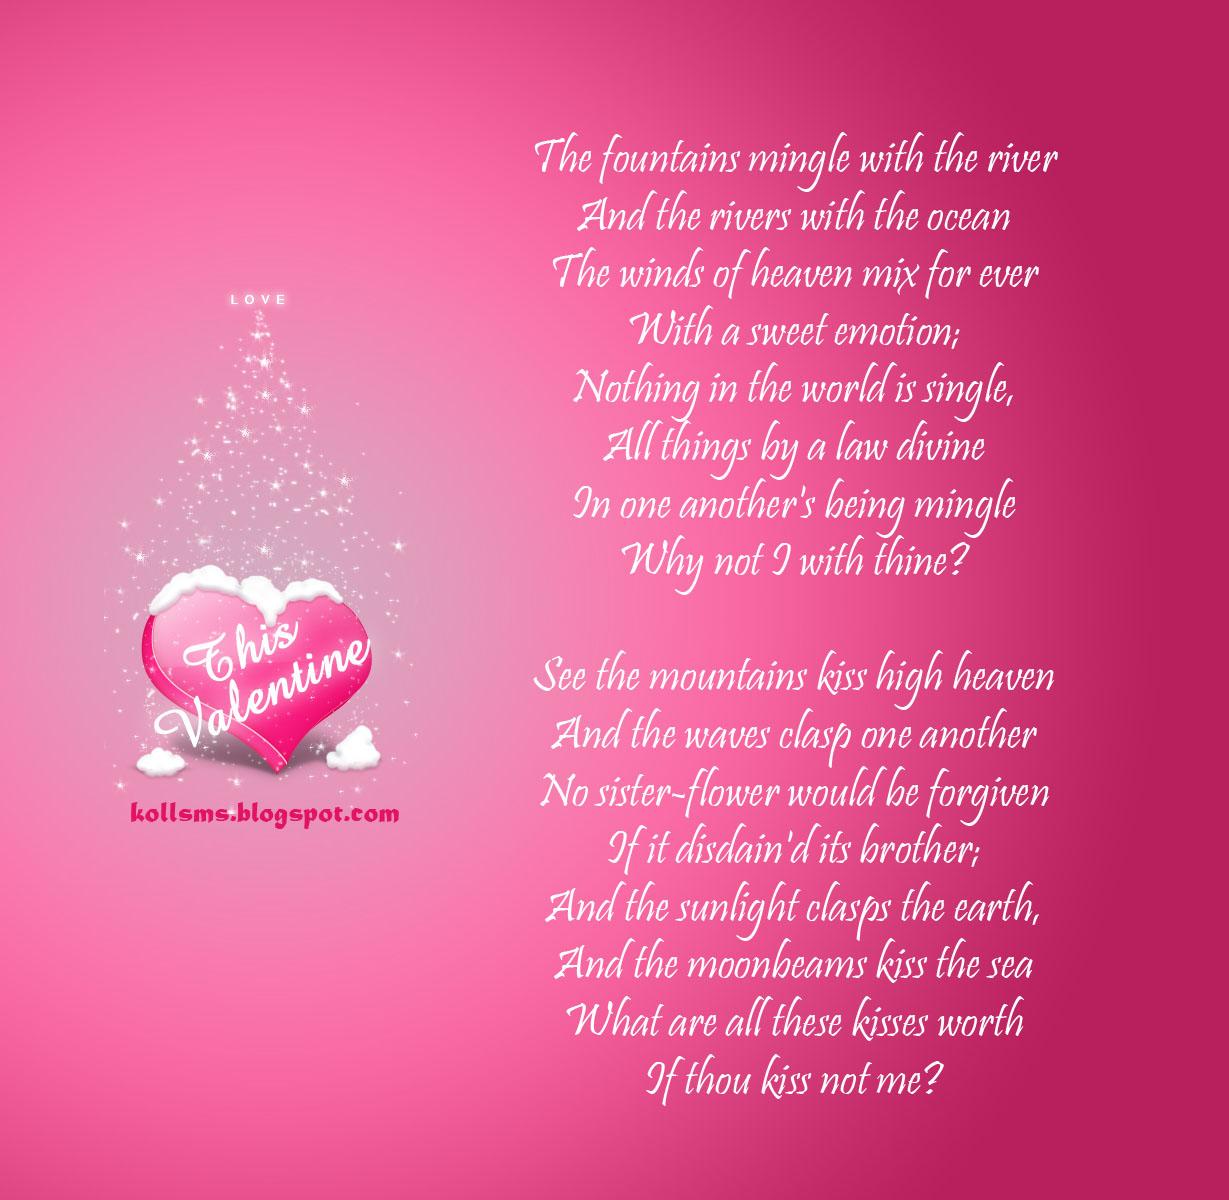 Poetry Wallpapers SMS Poems Ghazals Valentine Wallpaper 1229x1200